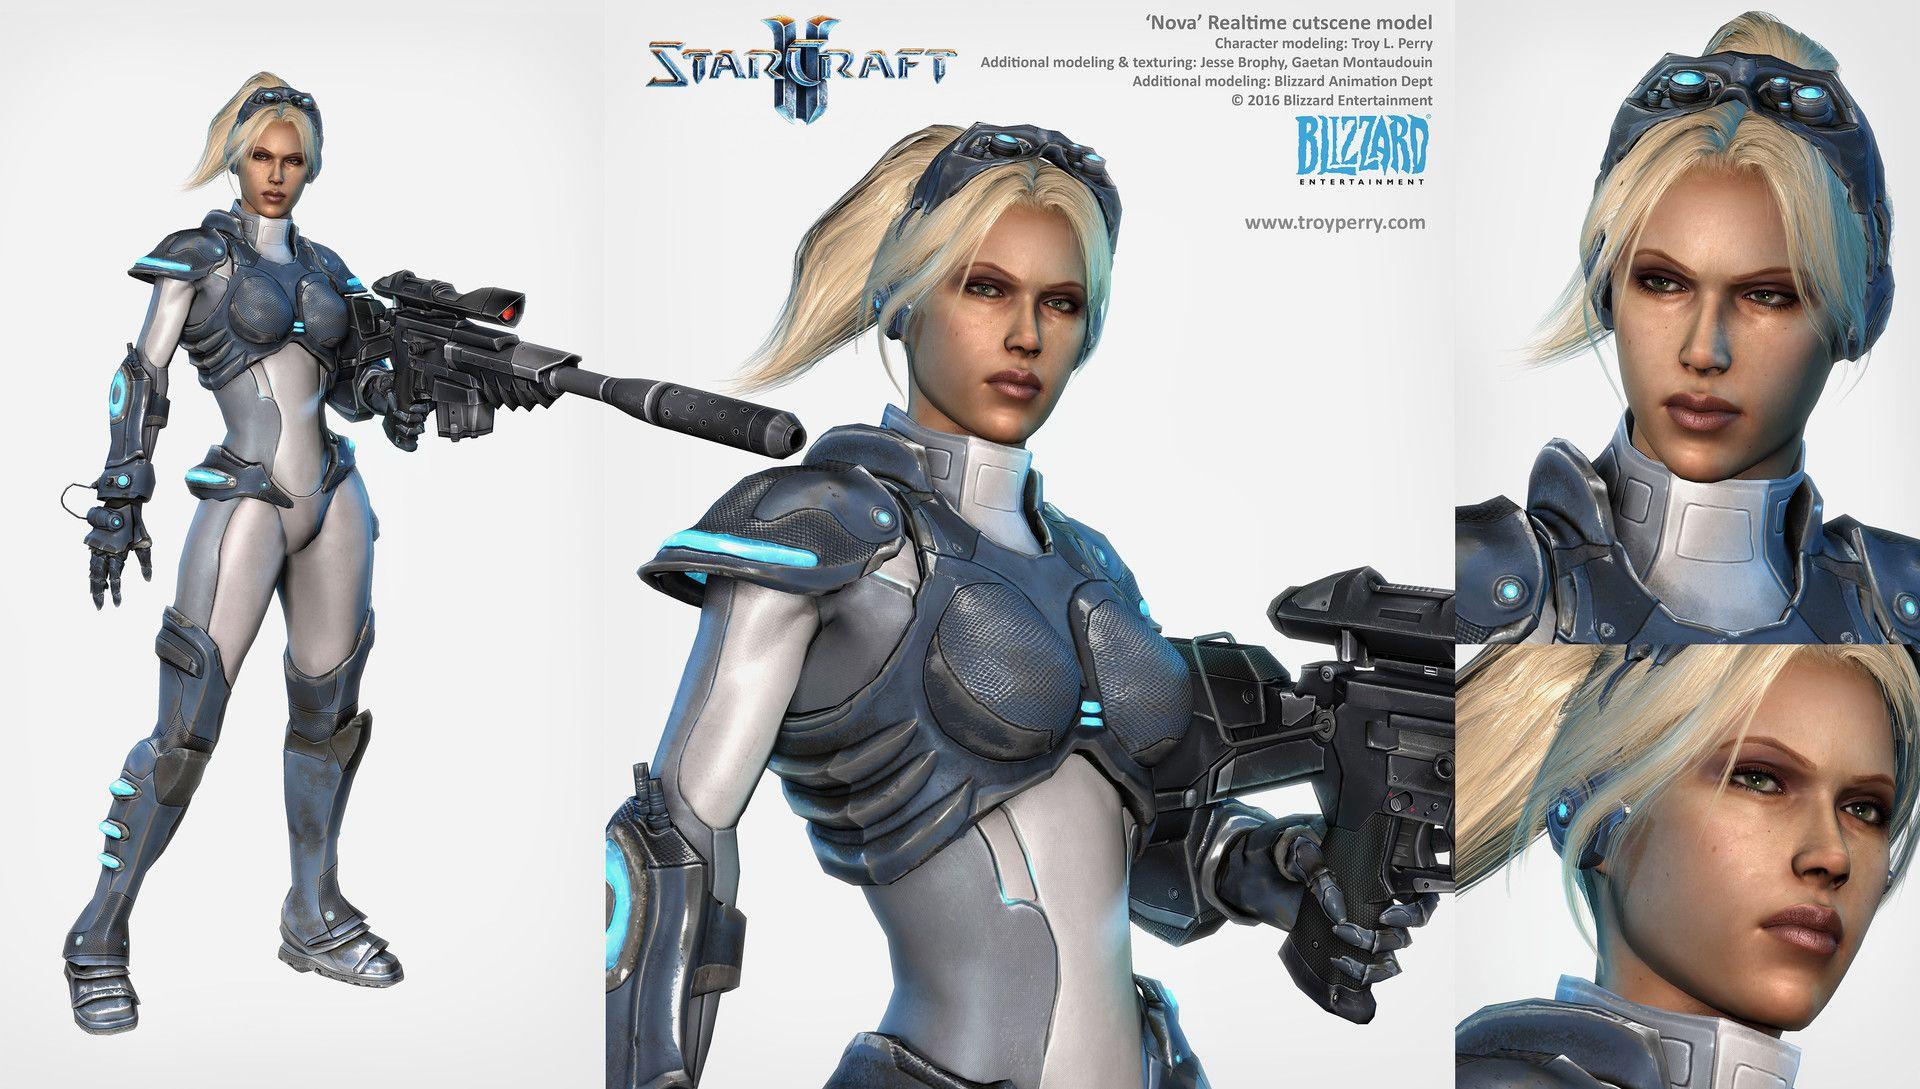 ArtStation - Starcraft2: Nova character model, Troy Perry